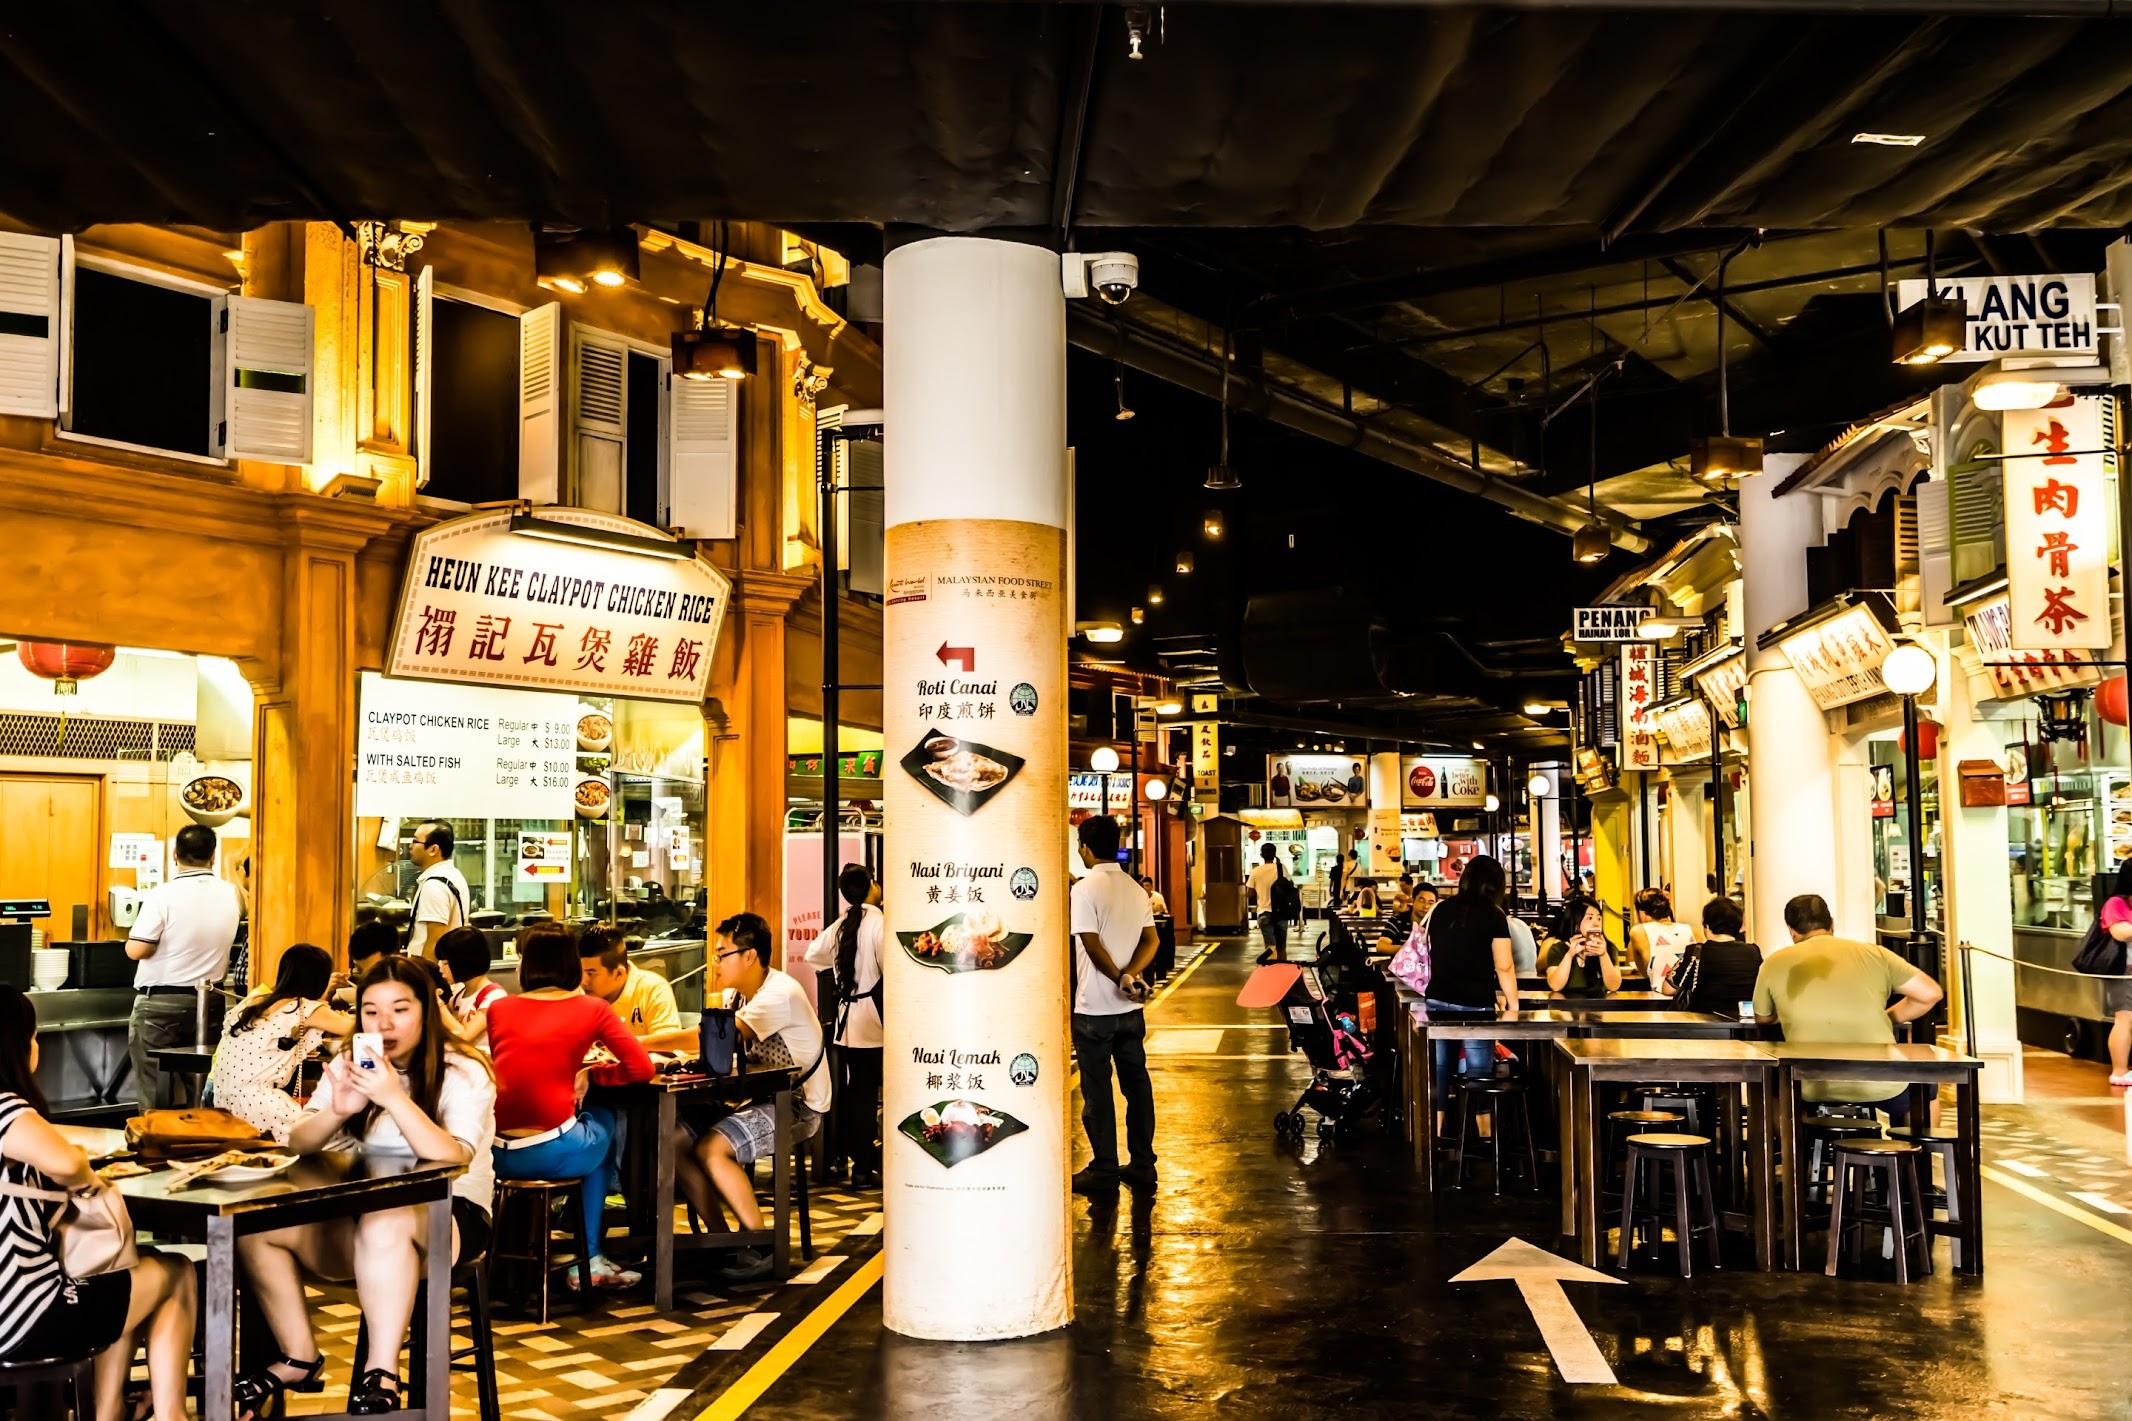 Singapore Sentosa Malaysian Food Street